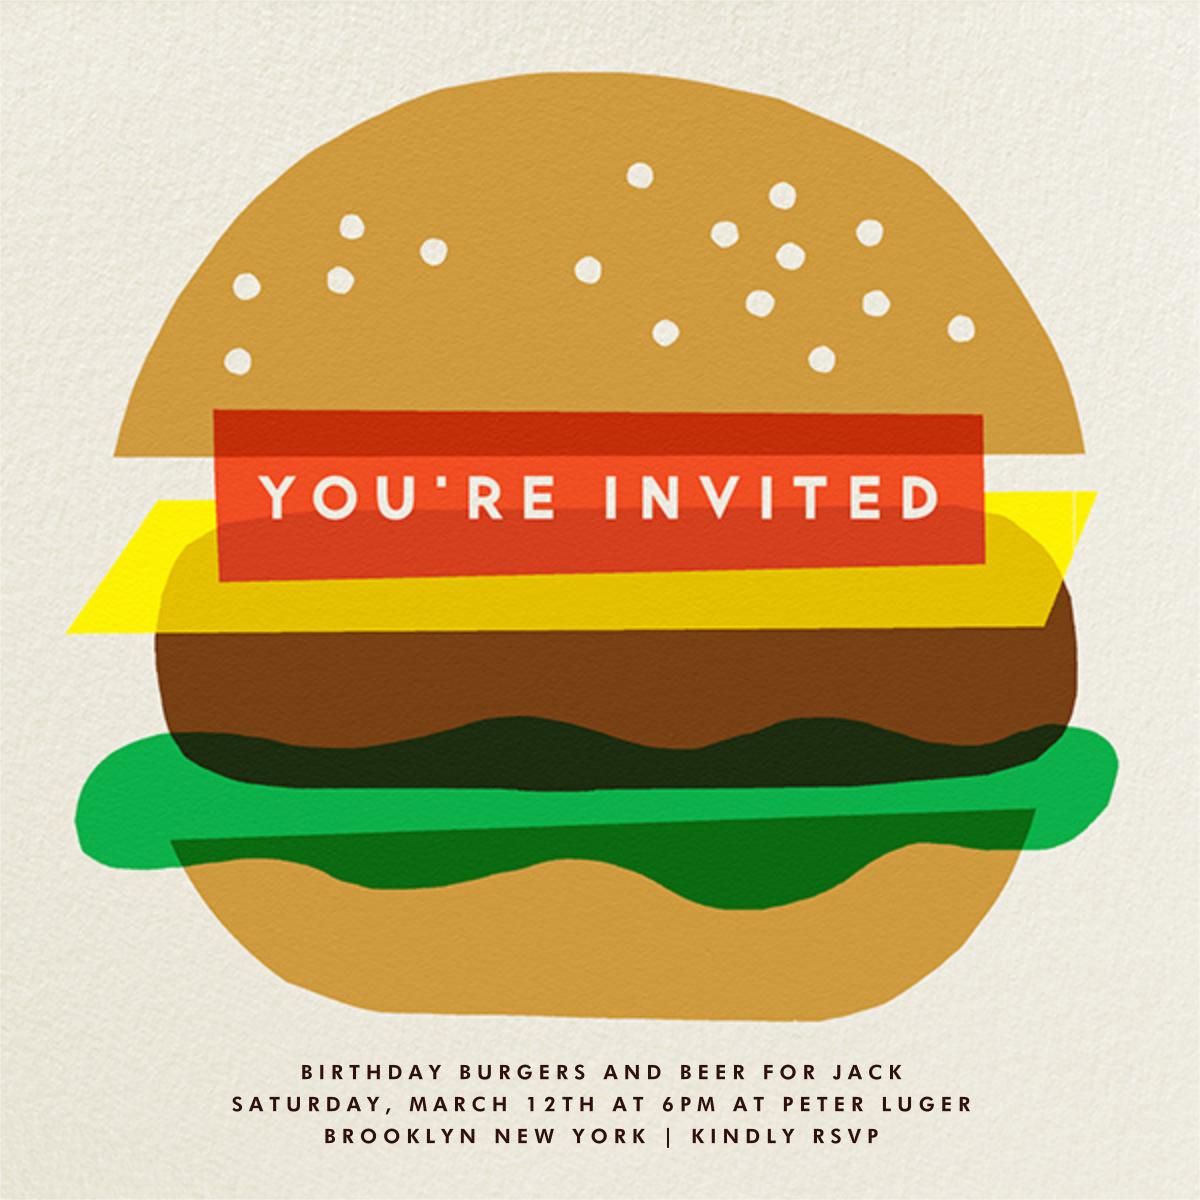 Burger Beer - The Indigo Bunting - Summer entertaining invitations